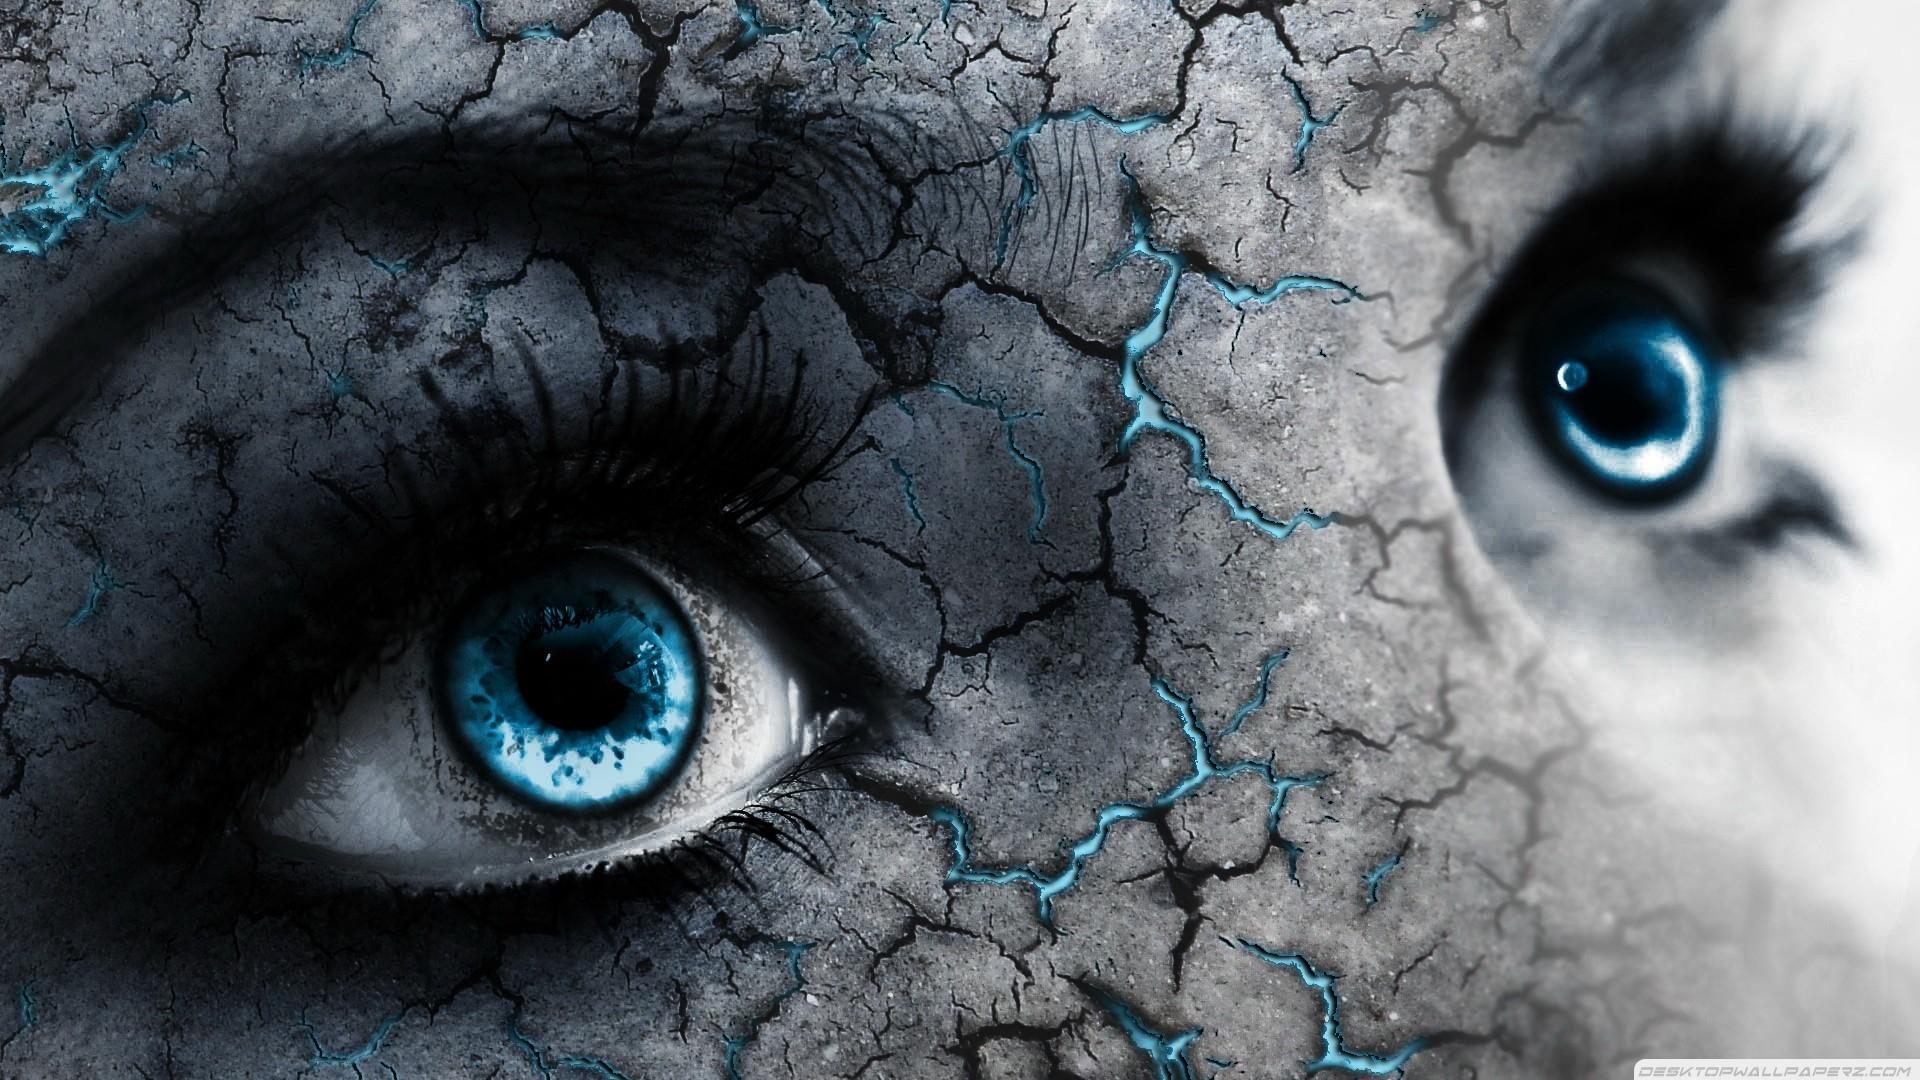 Blue Eyes Cracks 1920×1080 #57690 HD Wallpaper Res: 1920x1080